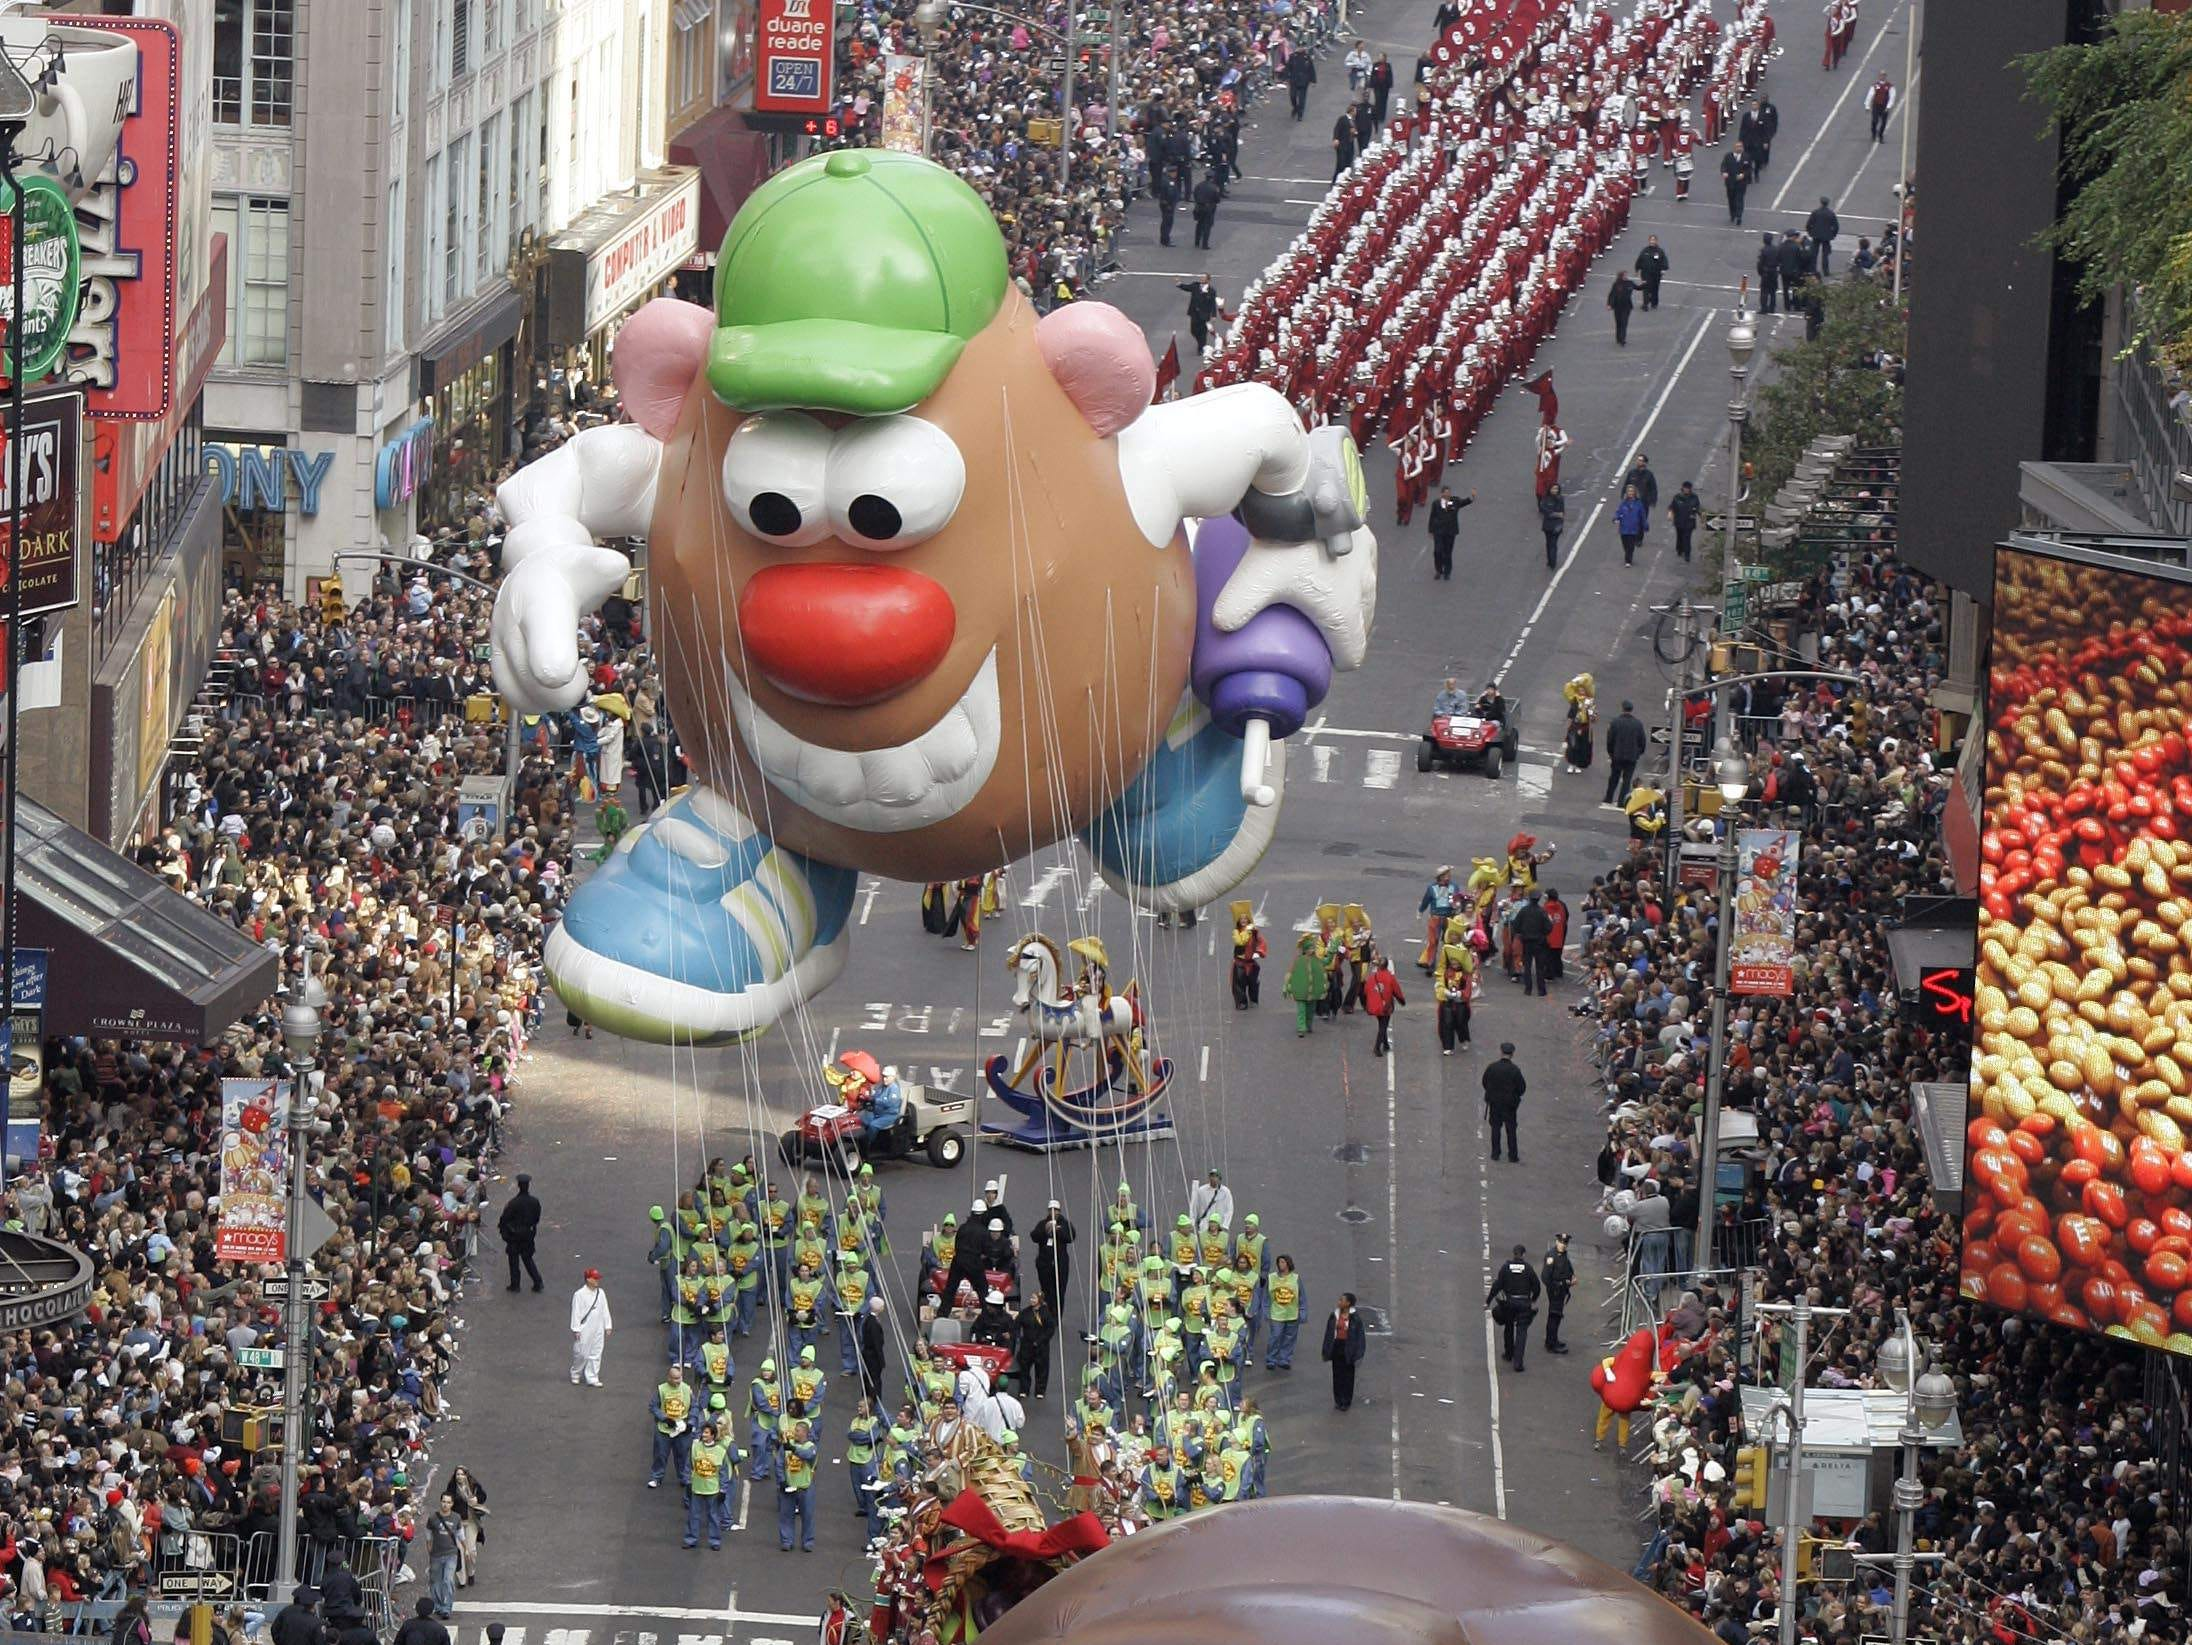 The Mr. Potato Head balloon follows Dora The Explorer down Broadway during the Macy's Thanksgiving Day parade in New York, Thursday, Nov. 22, 2007.     (AP Photo/Jeff Christensen)